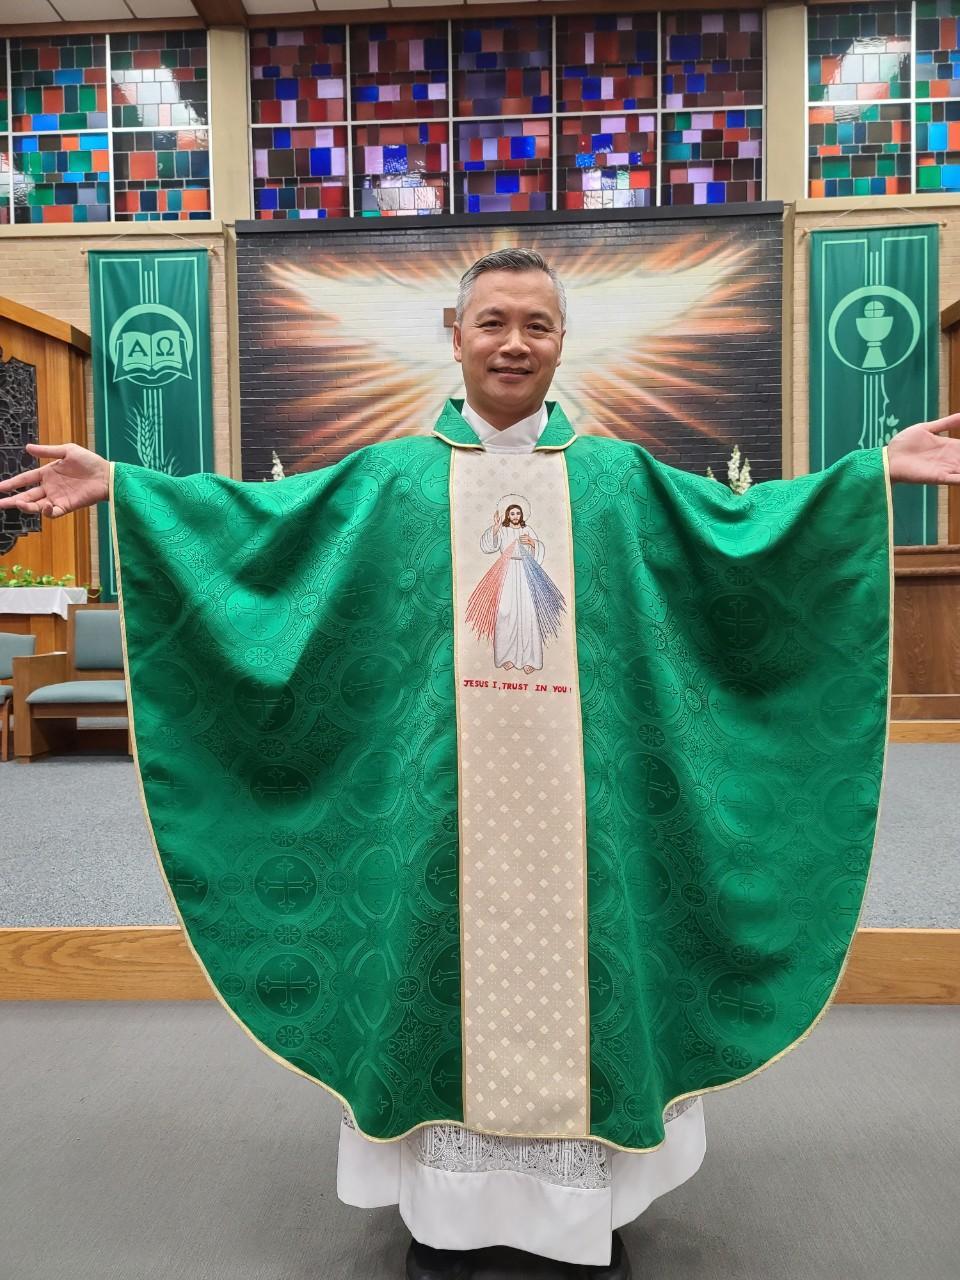 DIVINE MERCY GREEN VESTMENT